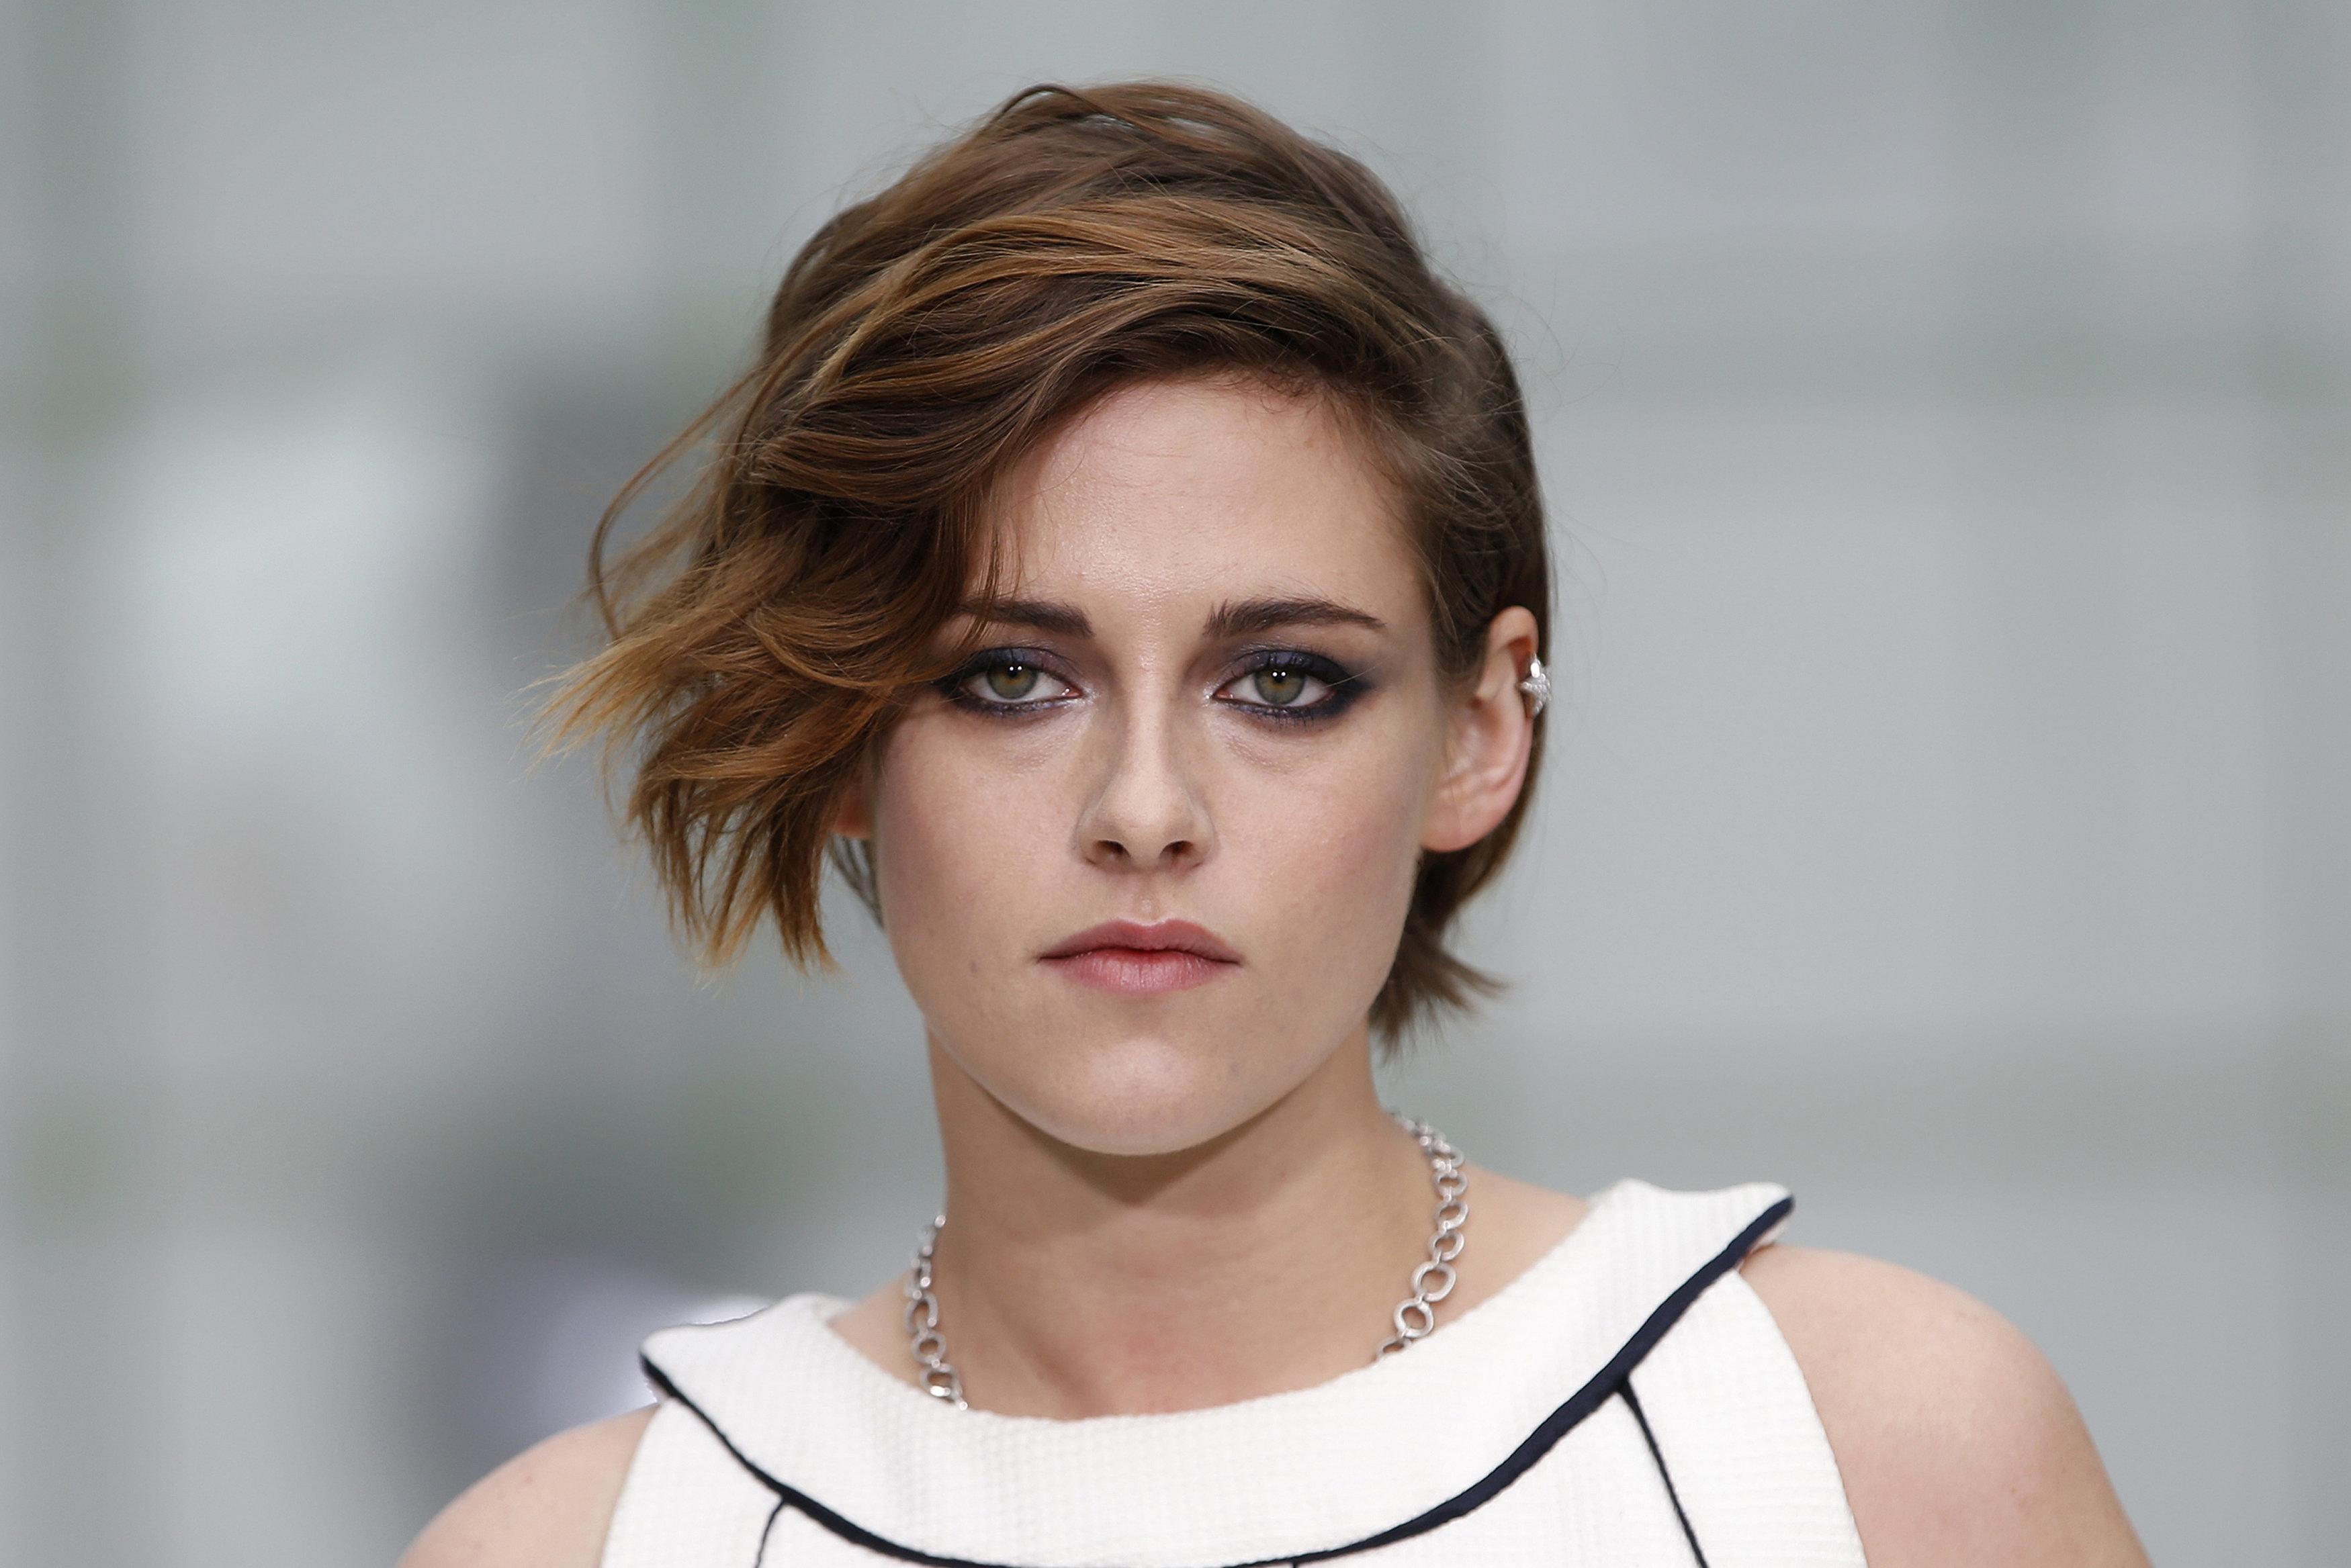 Kristen Stewart Addresses Donald Trump's Creepy Old 'Twilight'